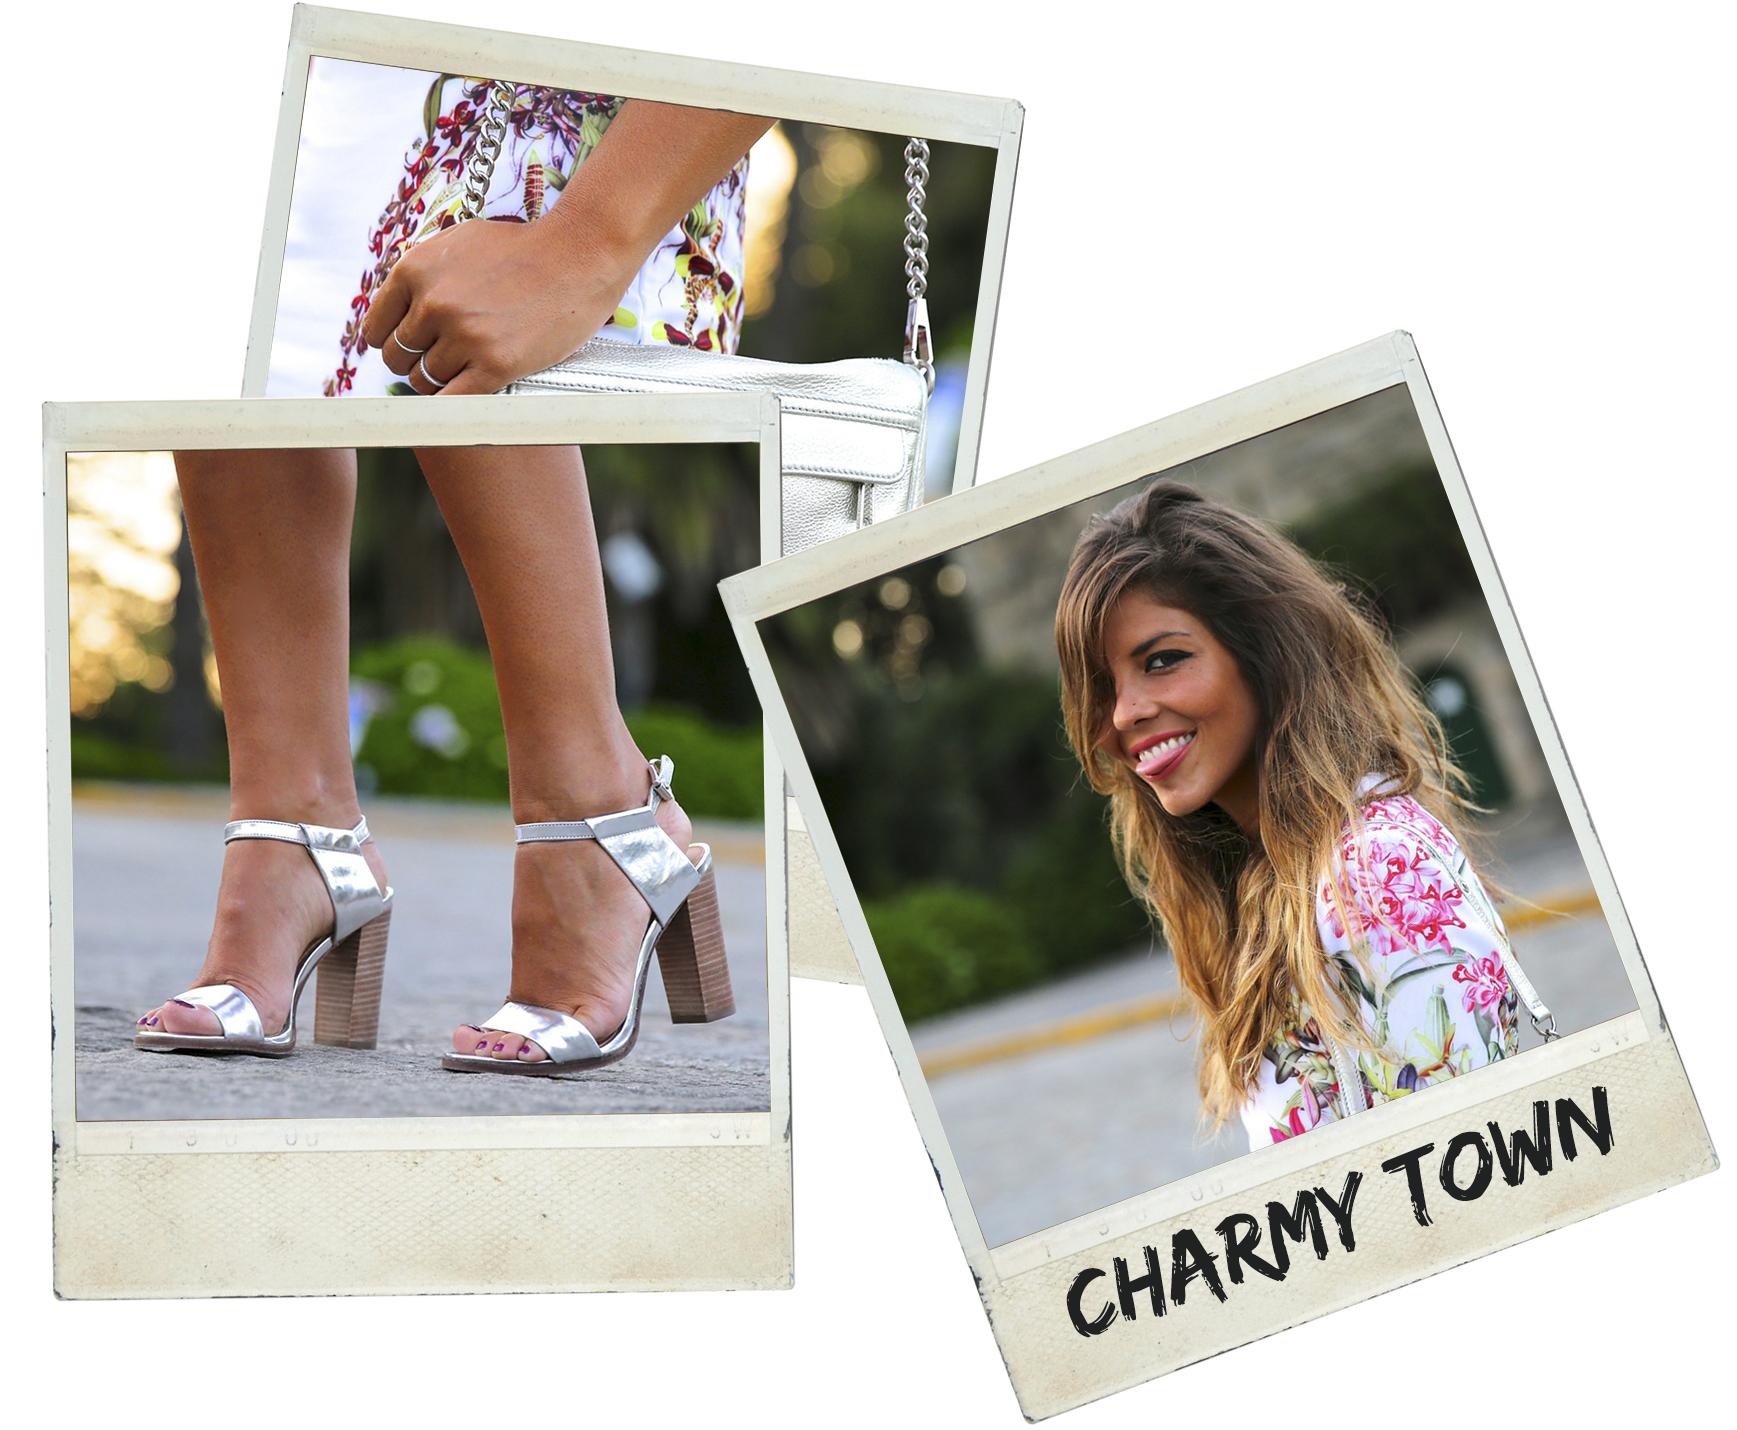 trendy_taste-look-outfit-street_style-ootd-blog-blogger-fashion_spain-moda_españa-silver_sandals-sandalias_plata-coach-vestido_flores-flower_print-polaroid